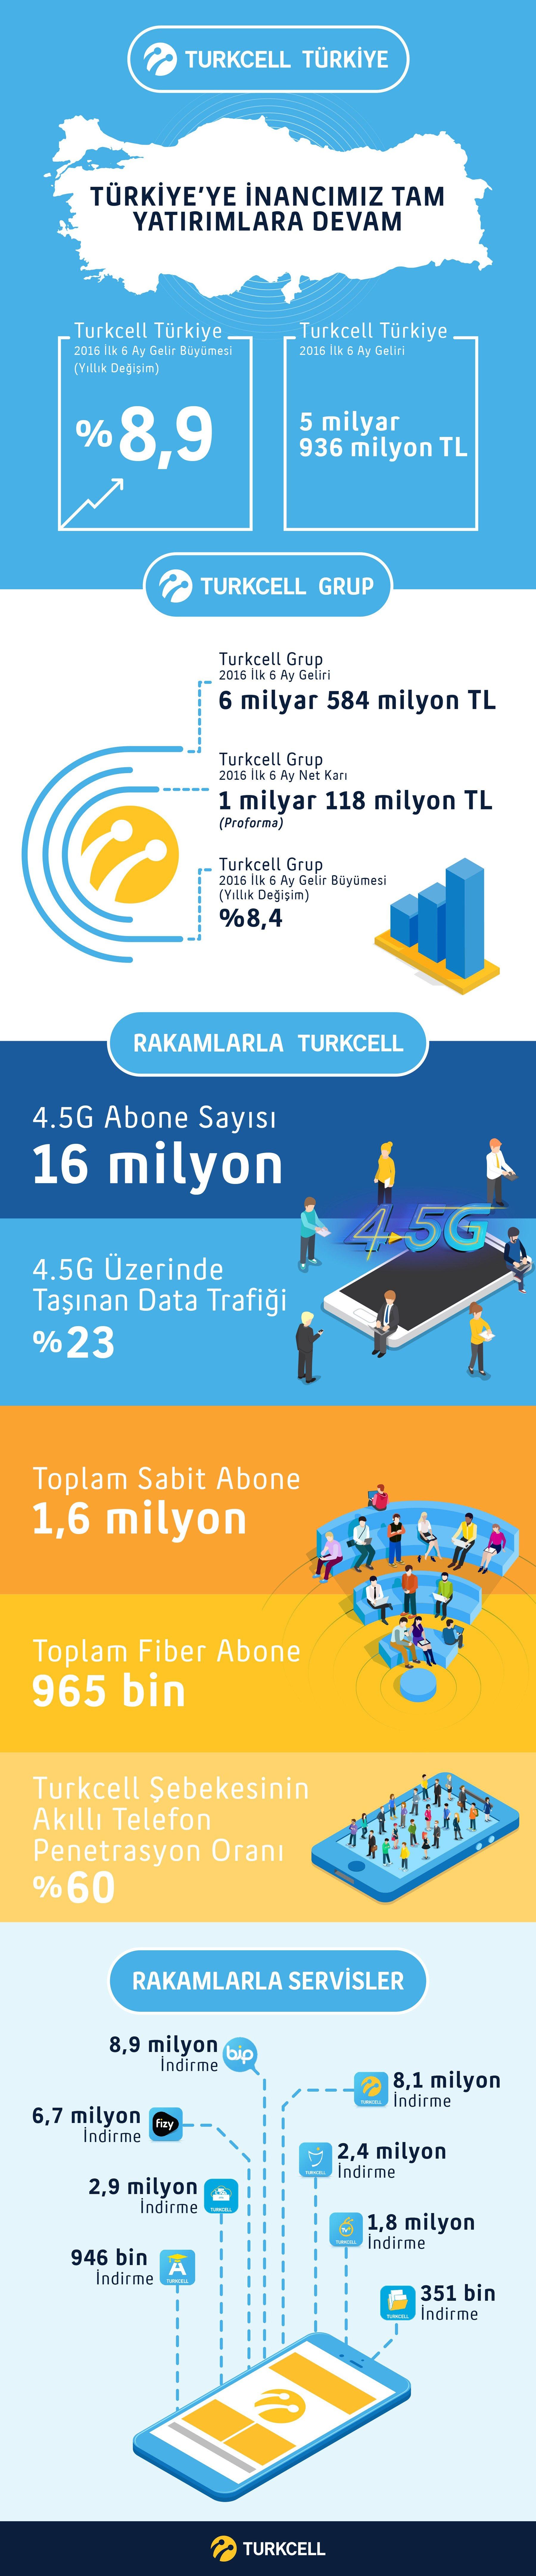 Turkcell_info